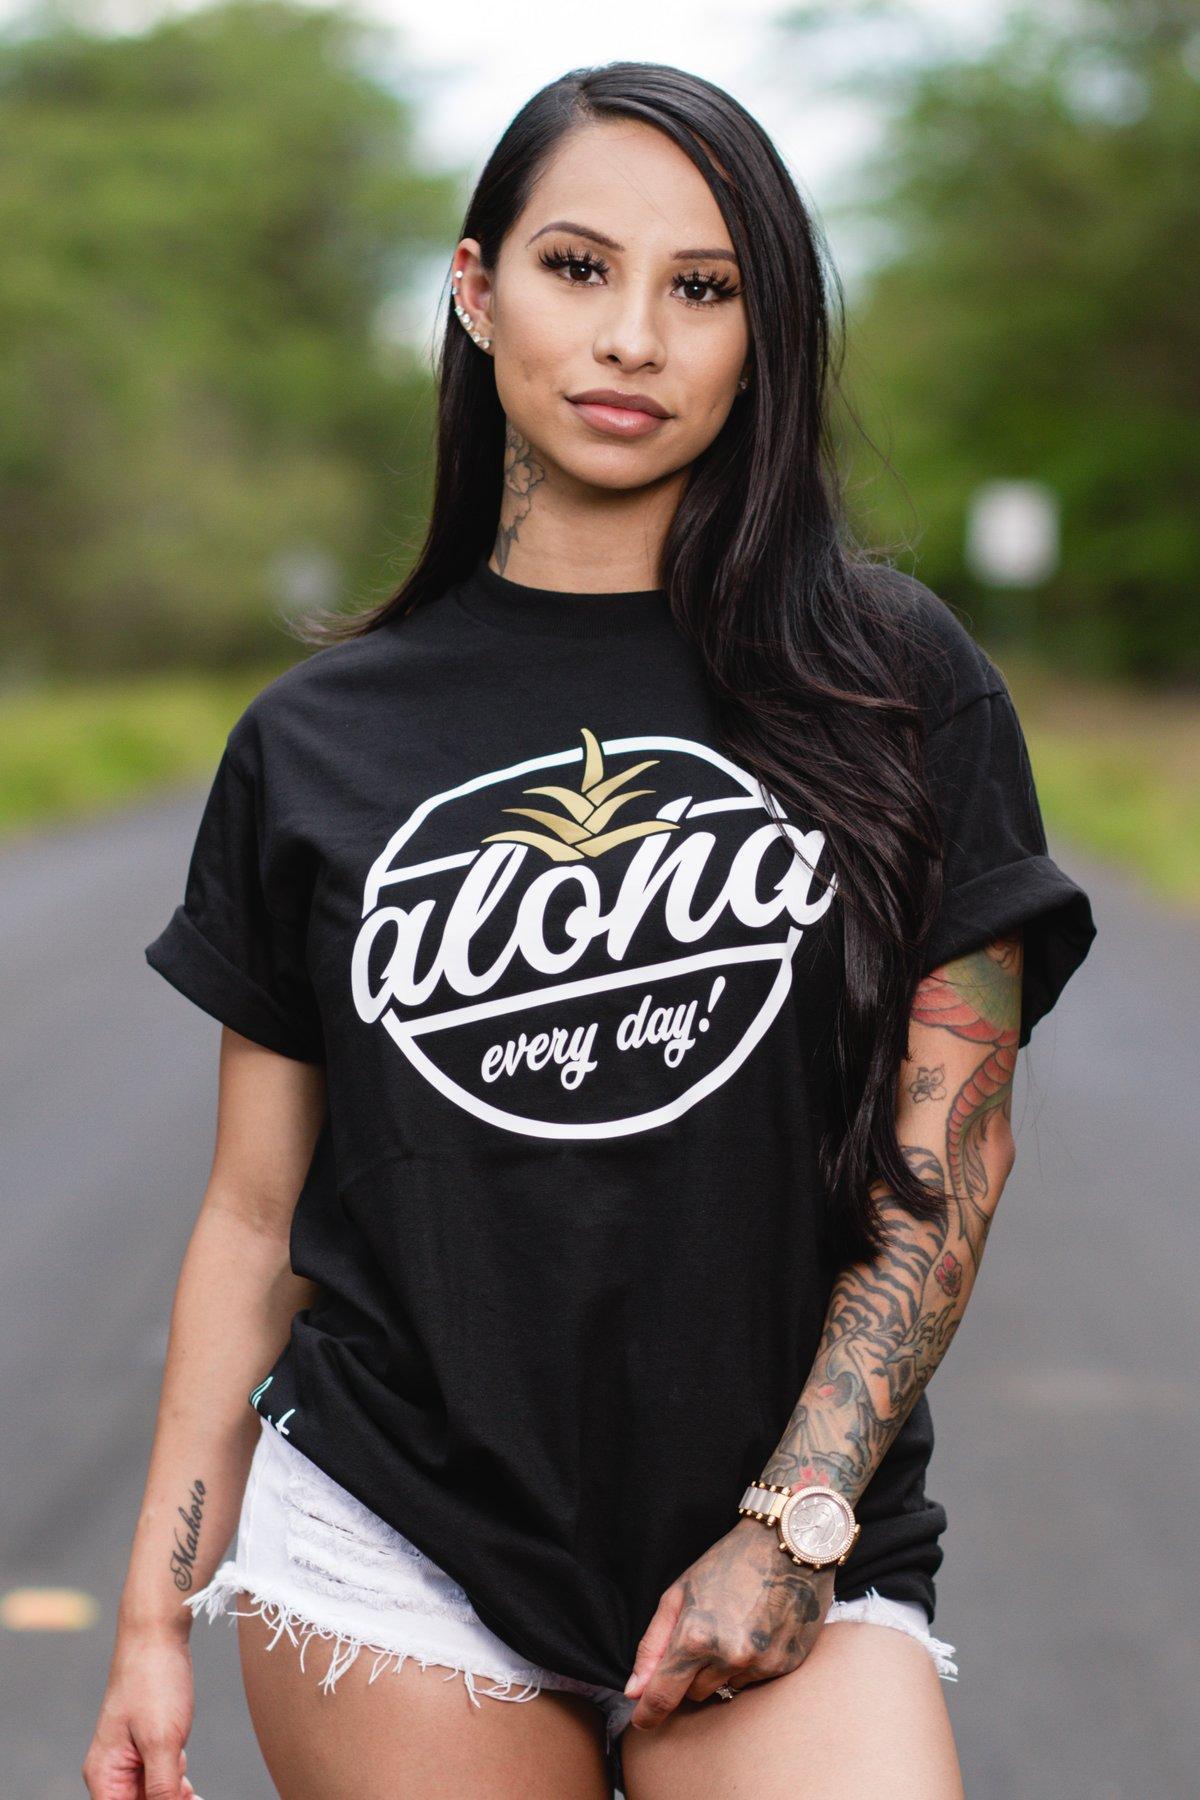 Aloha Every Day! Tee (Black/White/Gold)